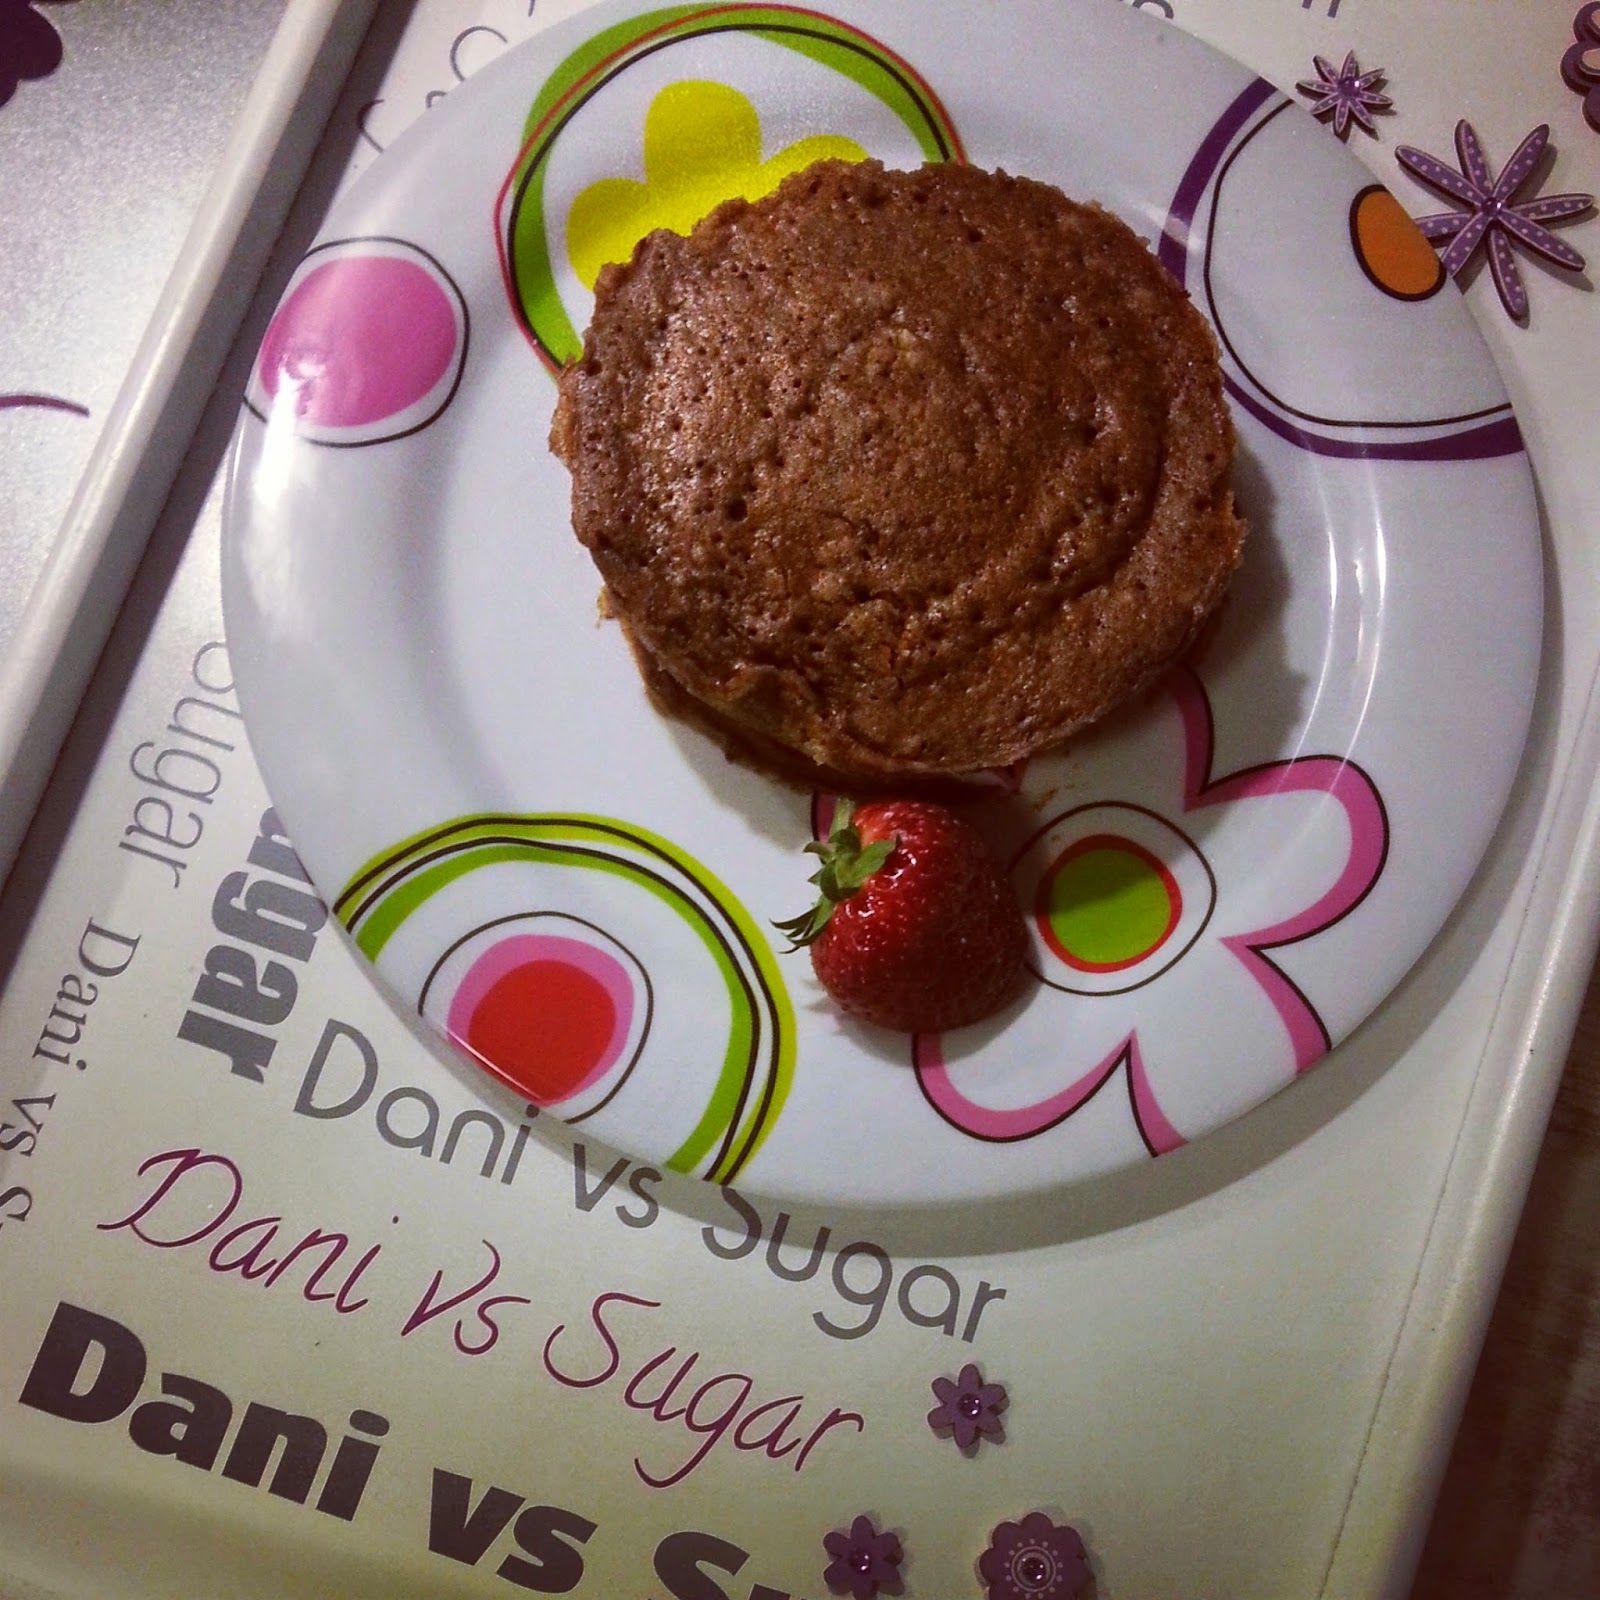 Dani Vs Sugar Lowcarb Haselnuss Schoko Mug Cake Soy Flour Soja